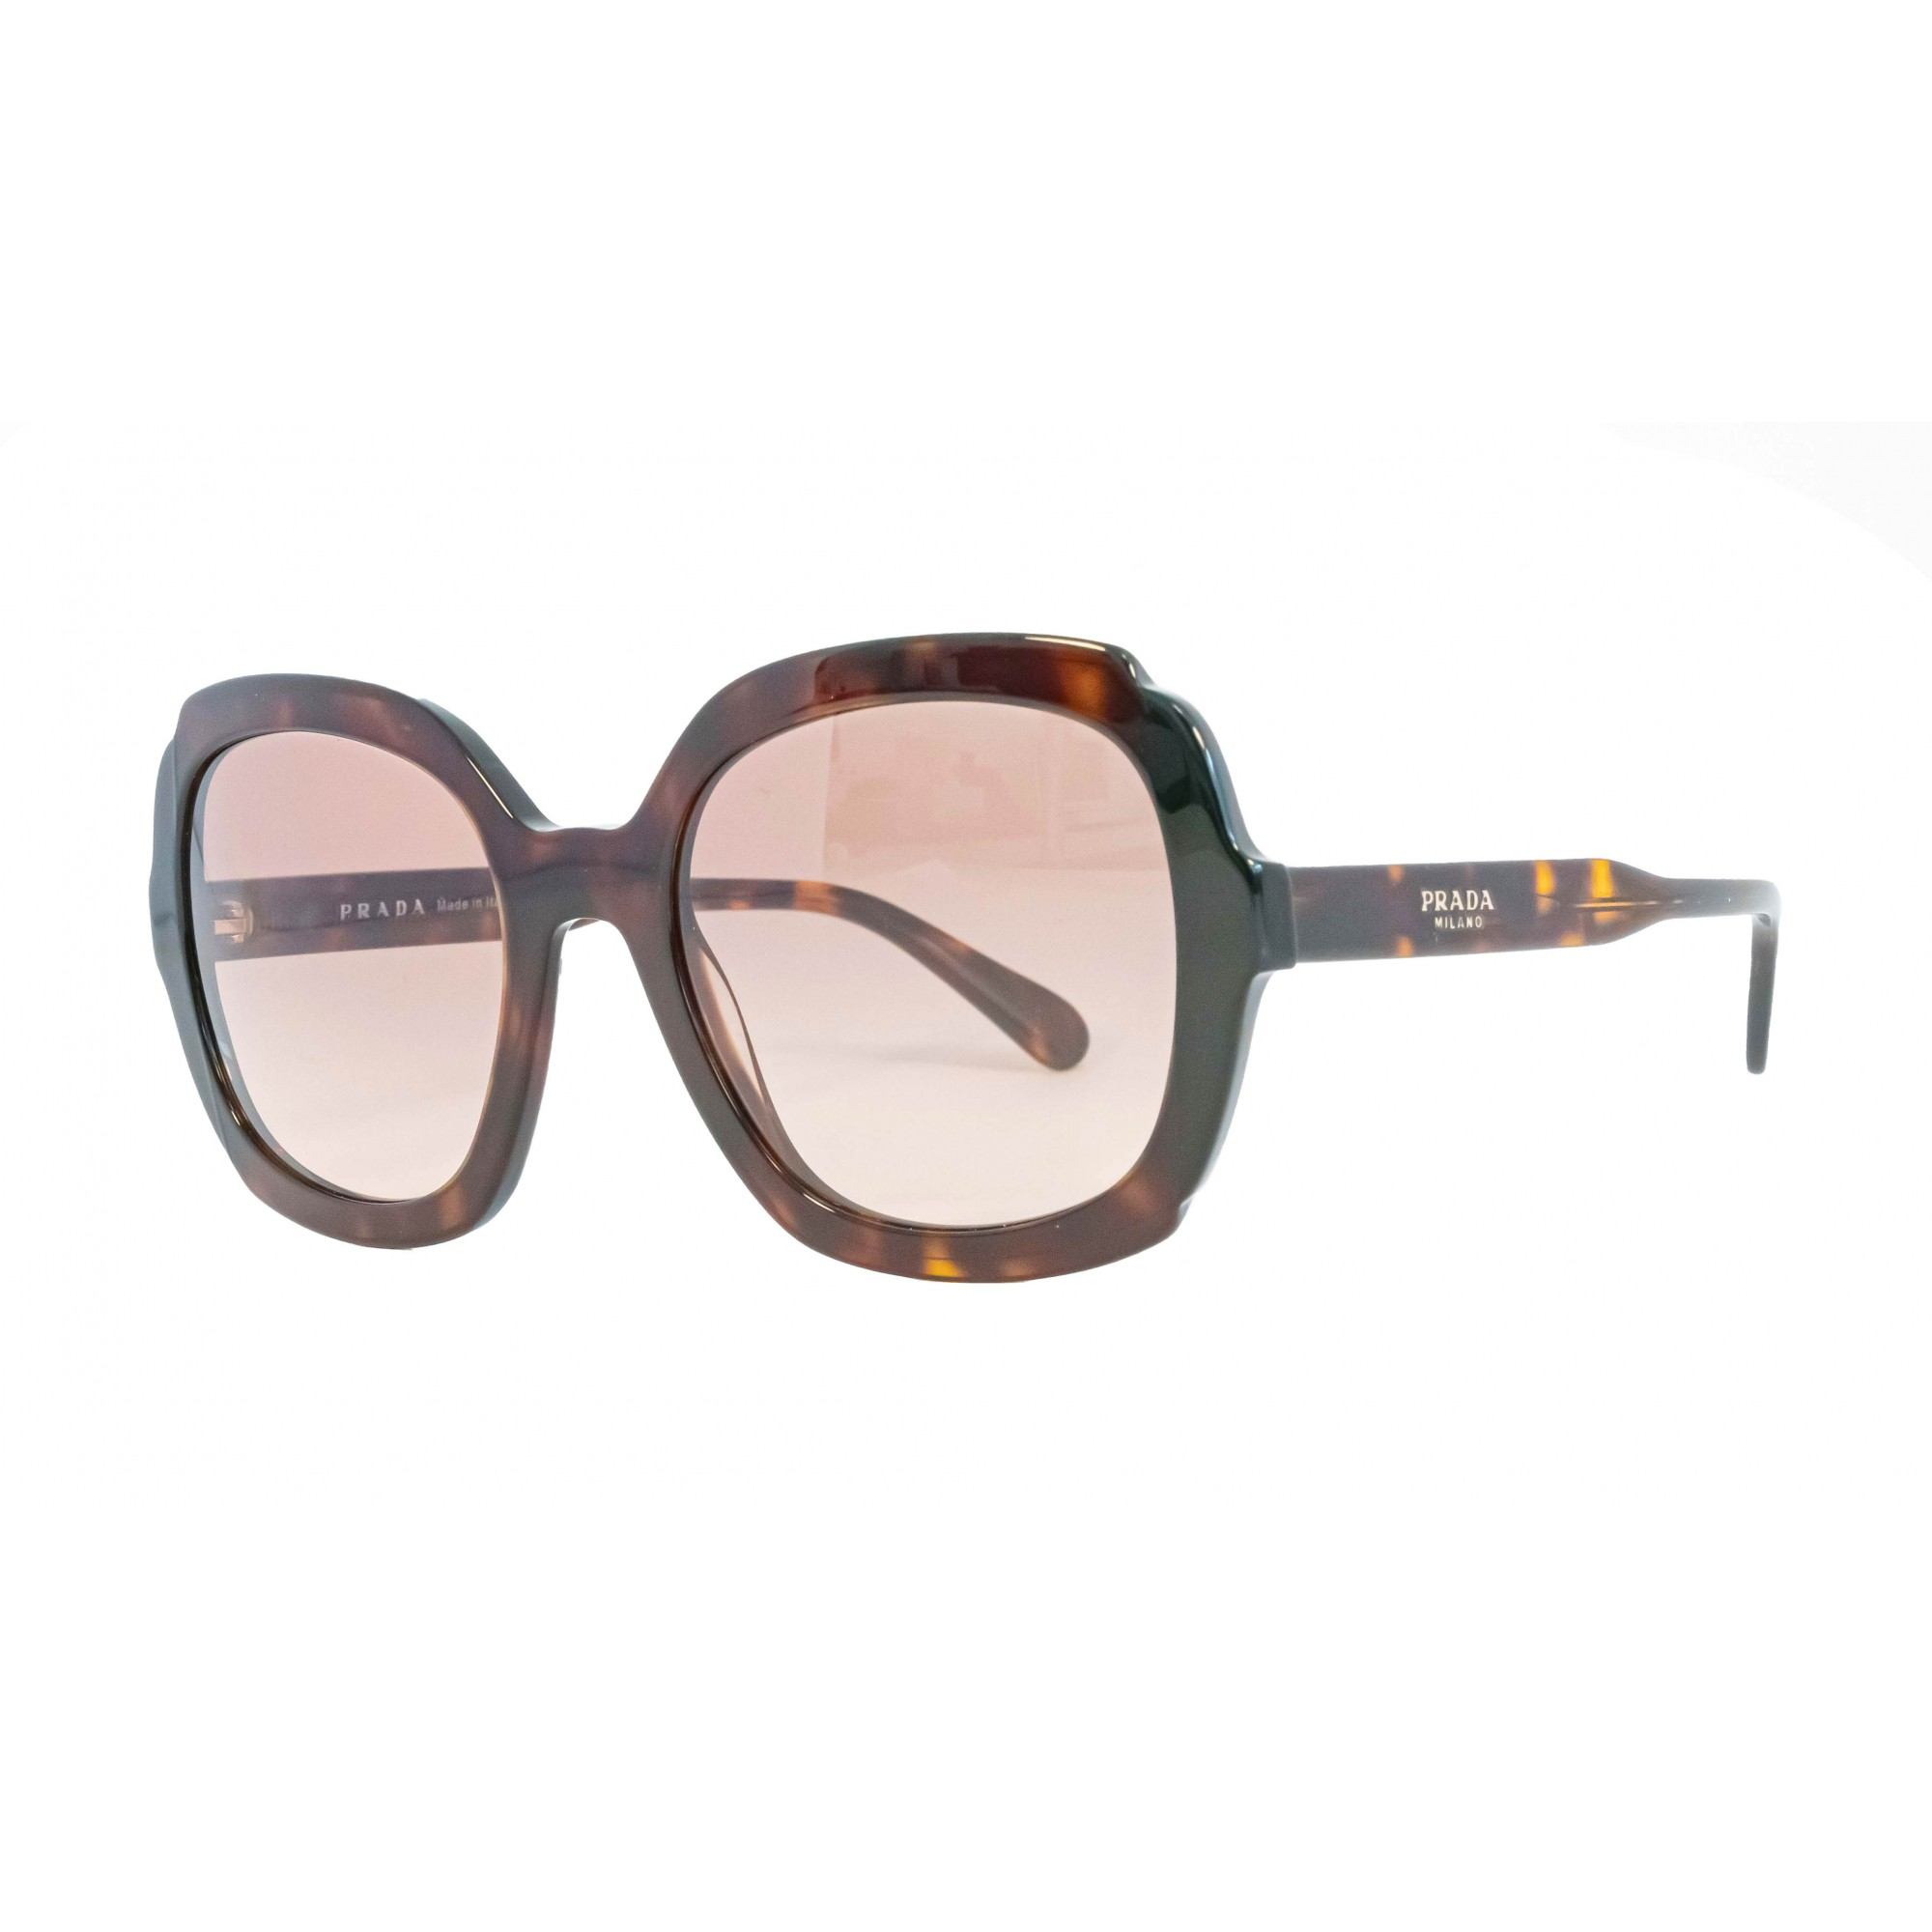 Óculos Prada Borboleta Spr16u 3913d0 54 Tartaruga